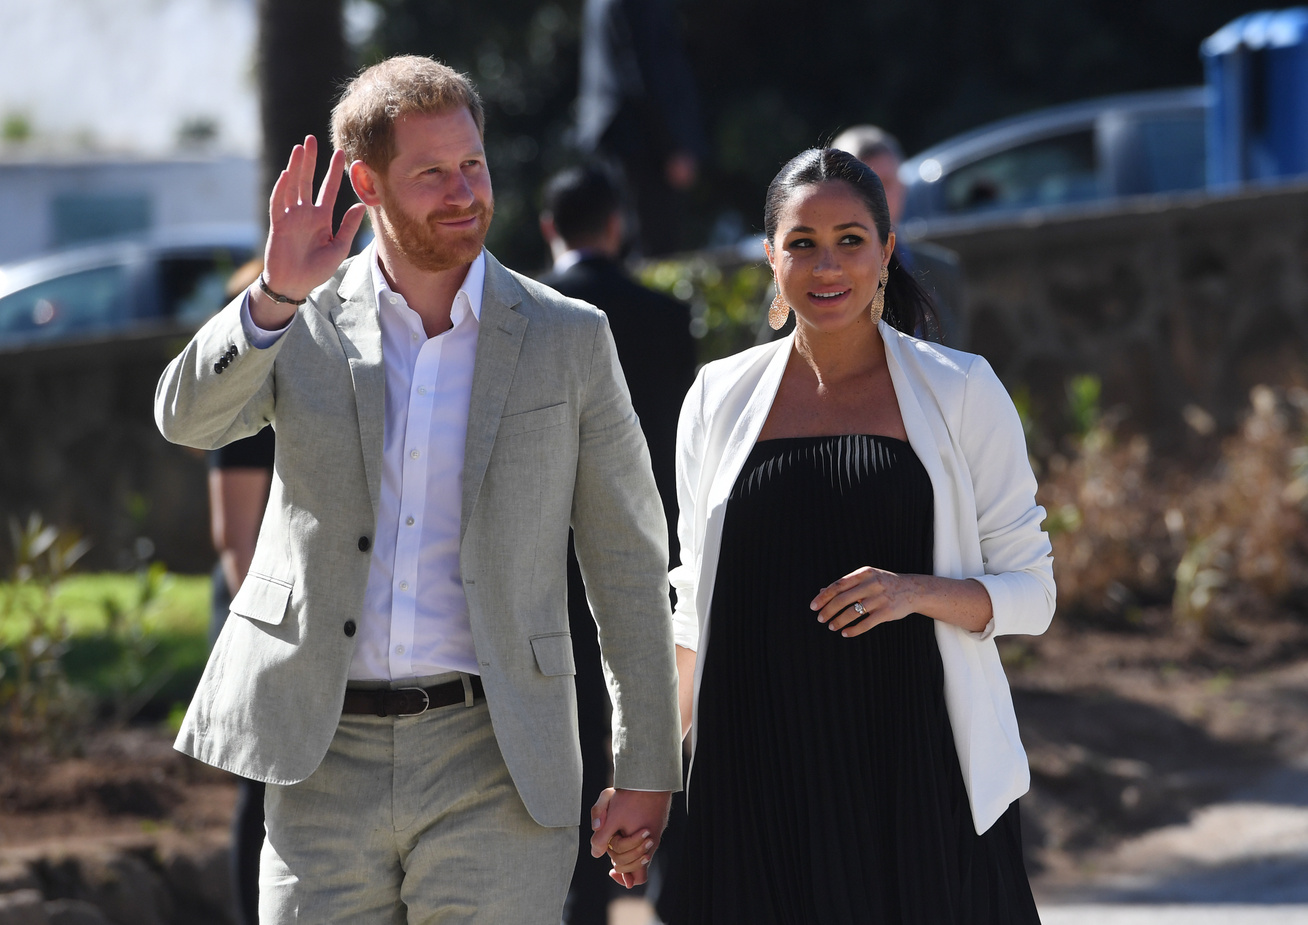 meghan-hercegne-harry-herceg-terhesseg-vicc-cover